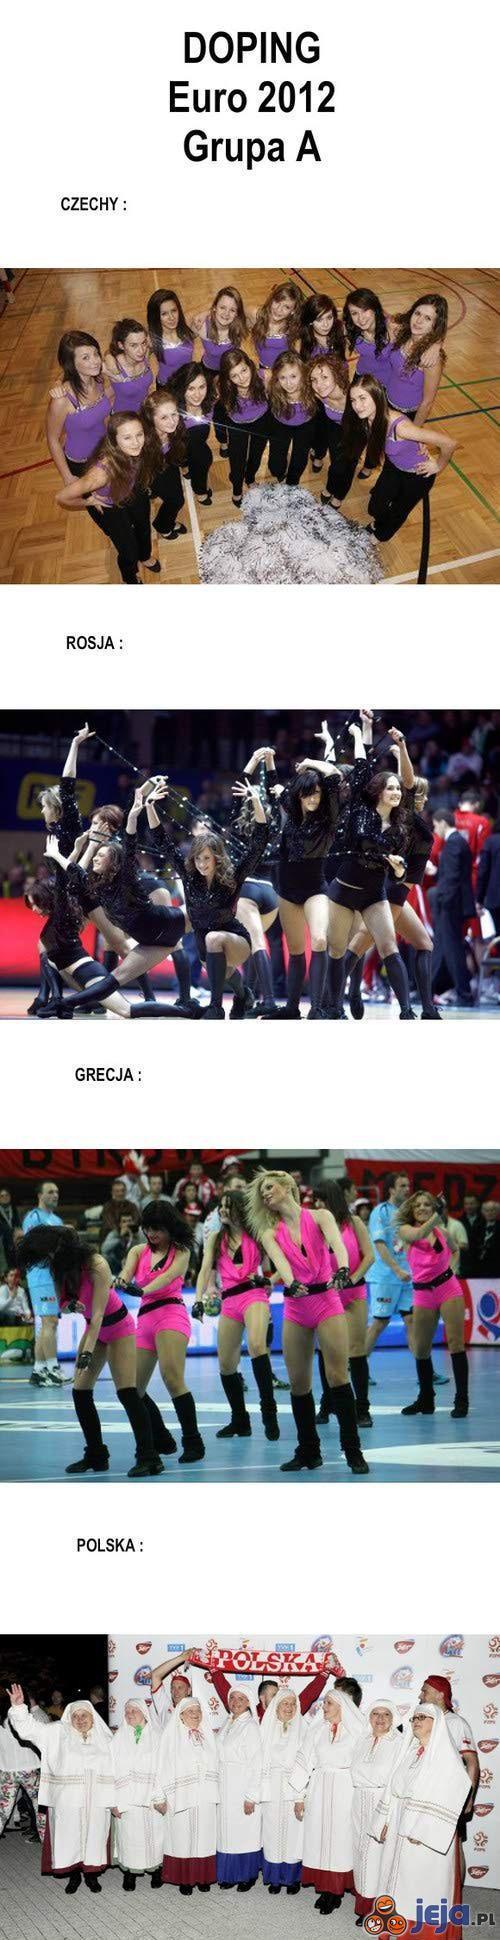 Doping Euro 2012